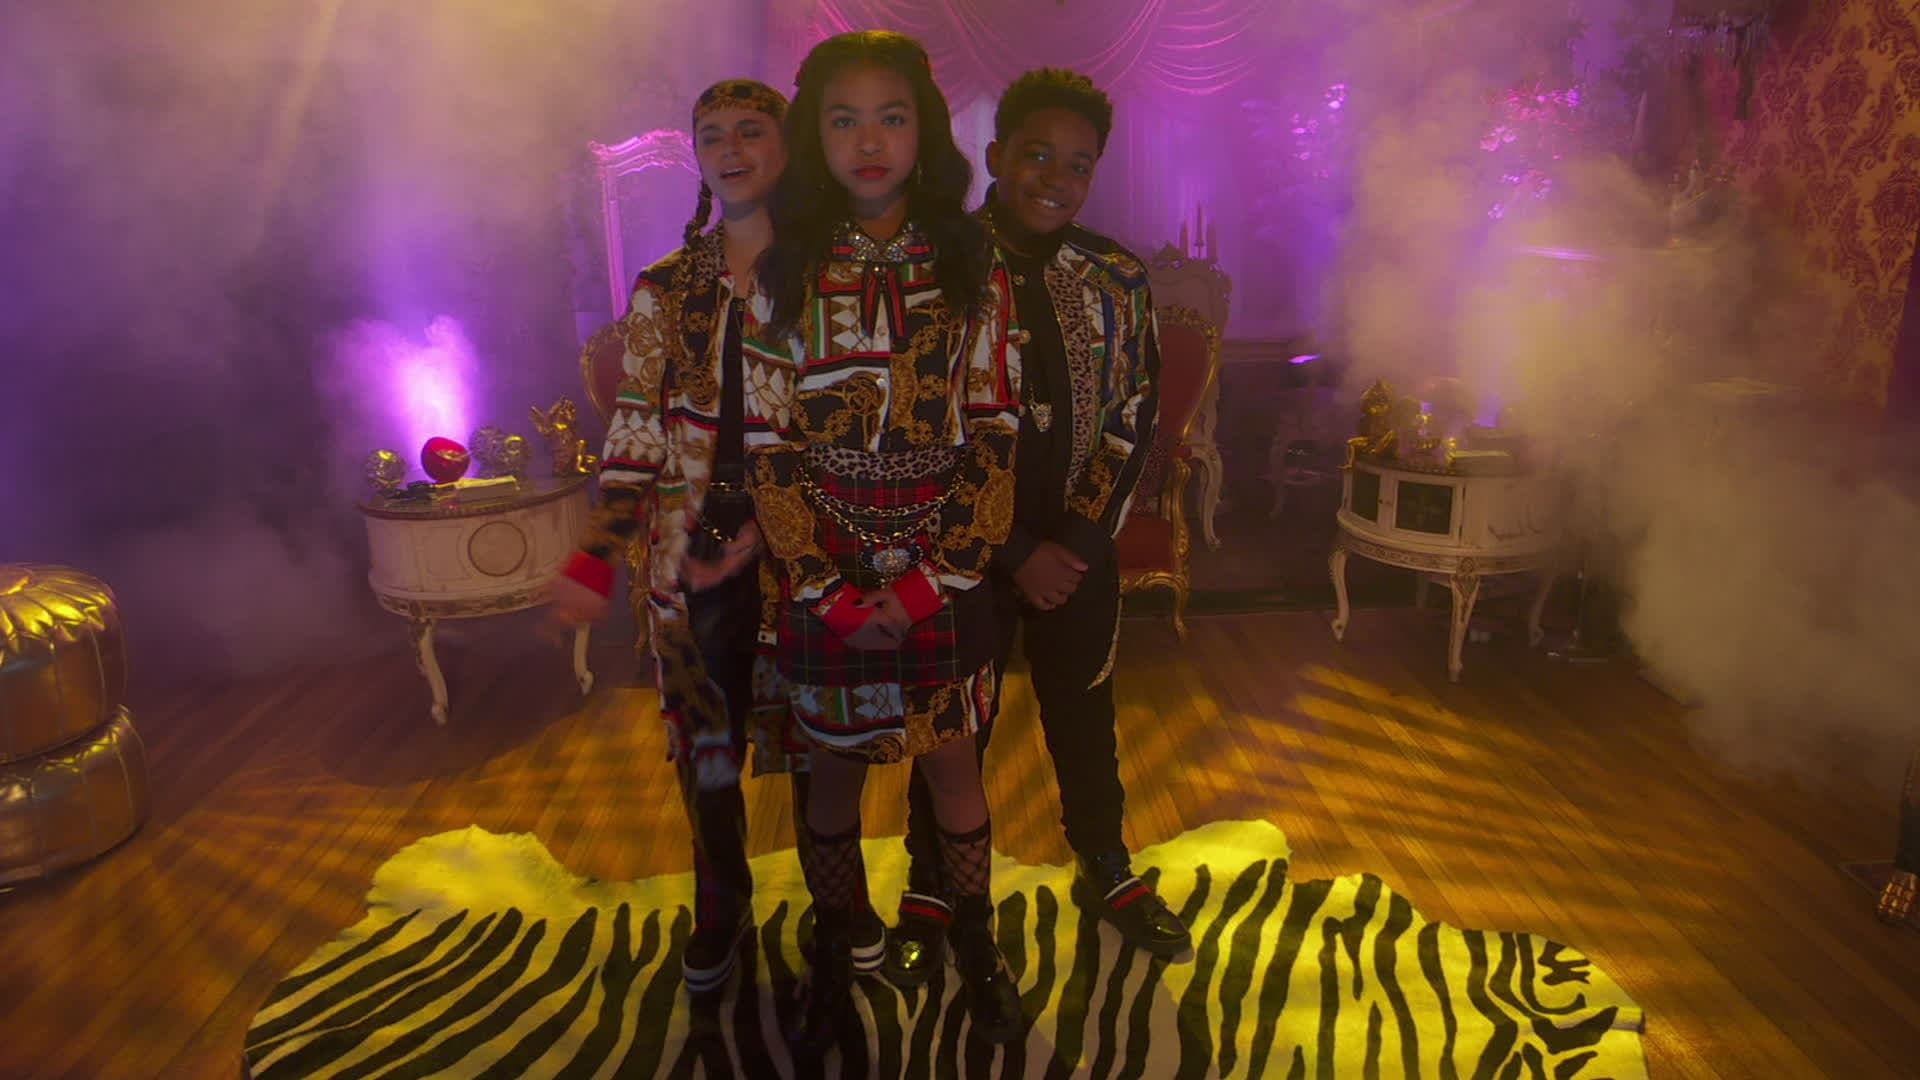 Music Video: Smoky Flow